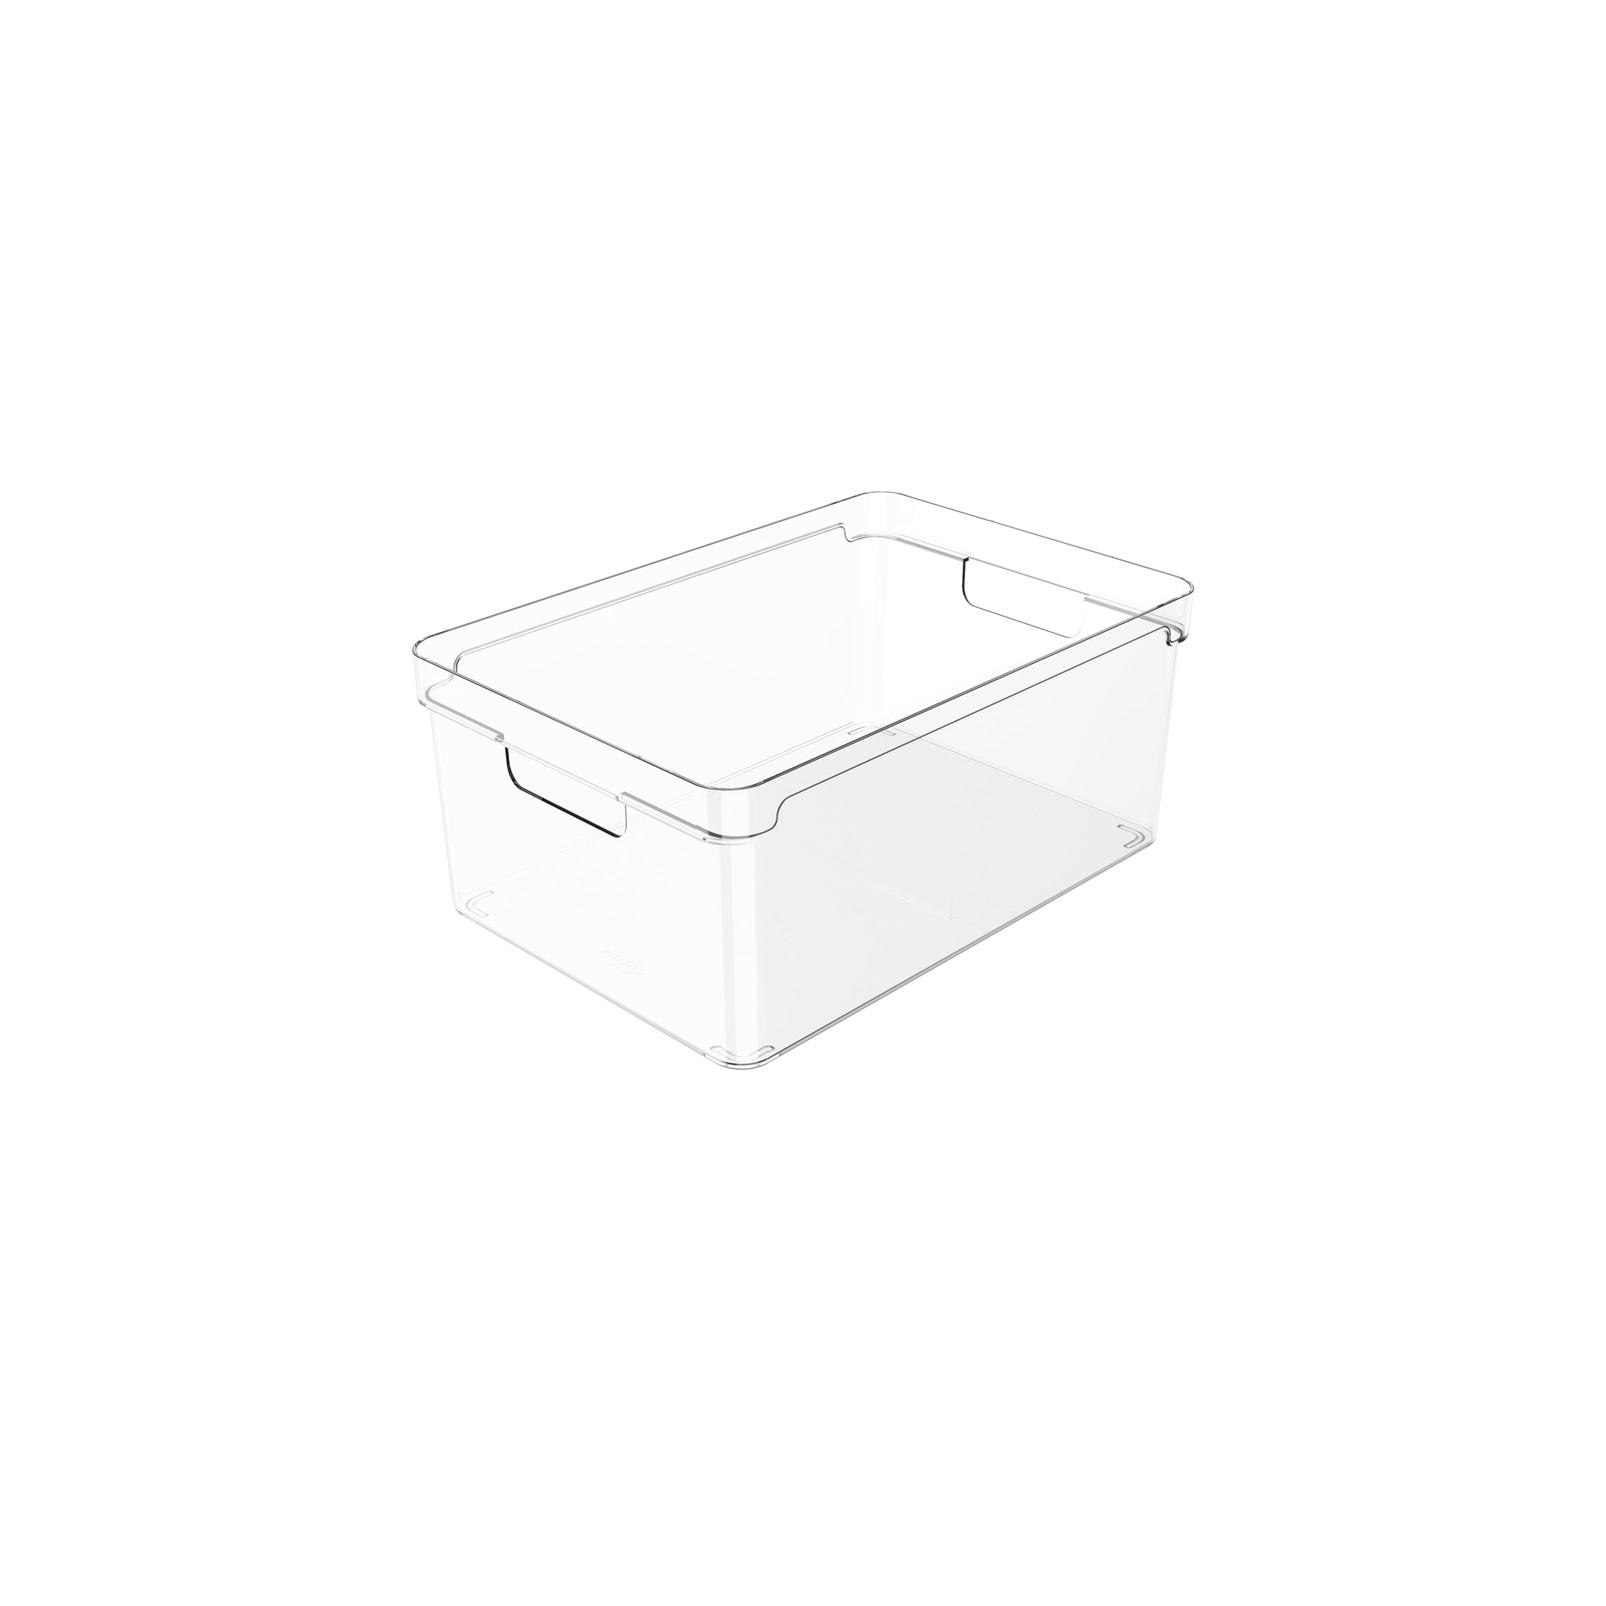 Organizador Clear 30x20x13cm Natural - Ou